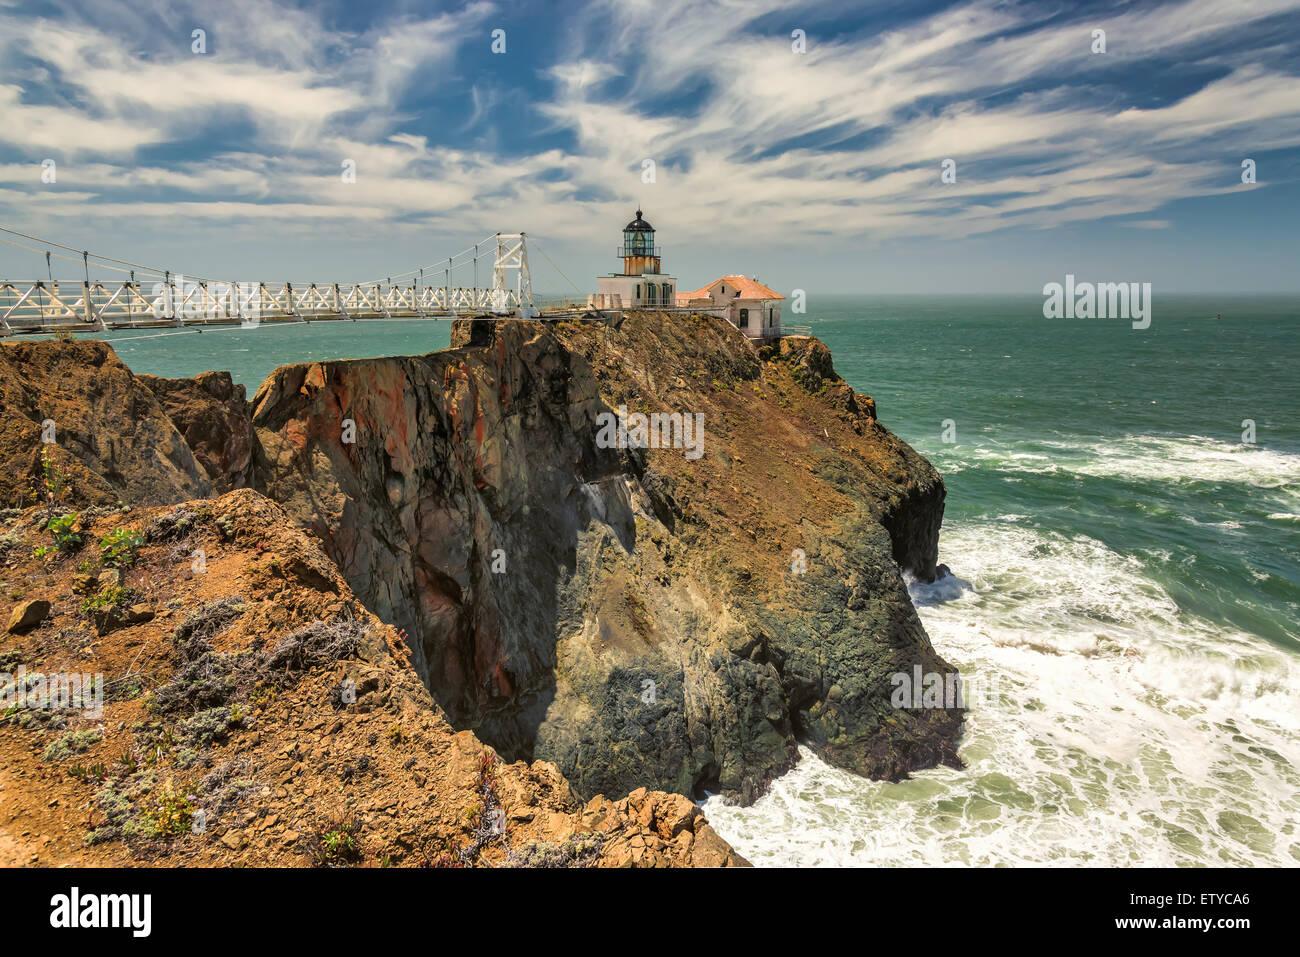 The bridge to Point Bonita Lighthouse on the rock, San Francisco, California - Stock Image